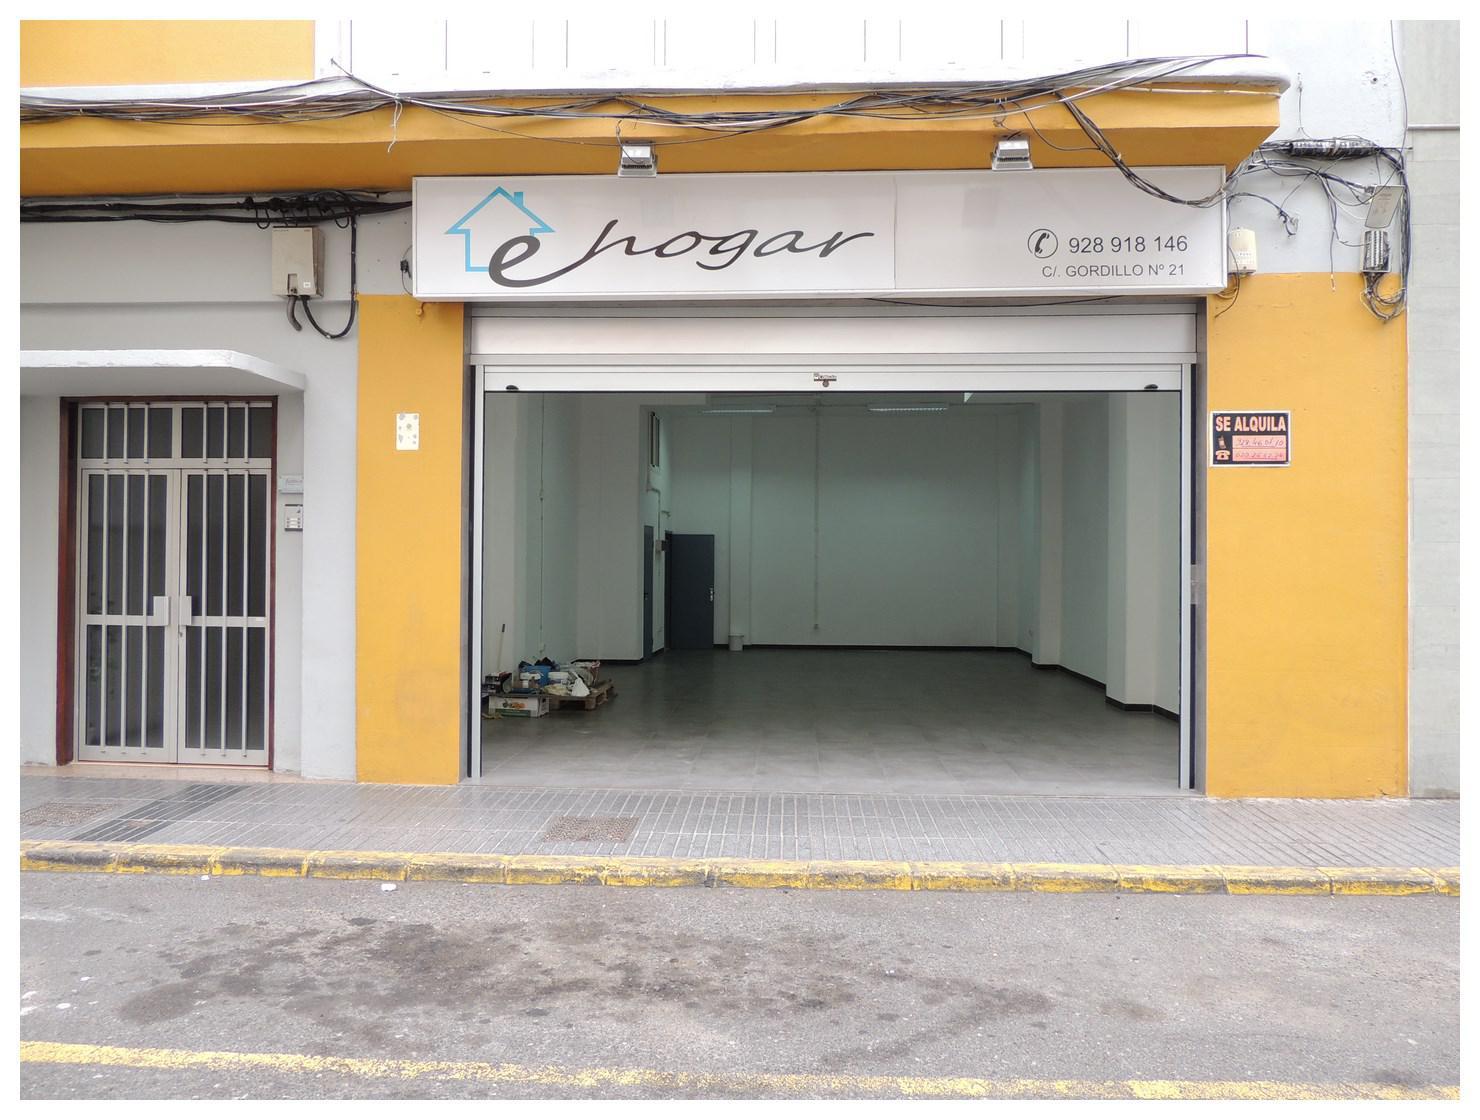 164977 - Estupendo local en la calle Gordillo, (La Naval).